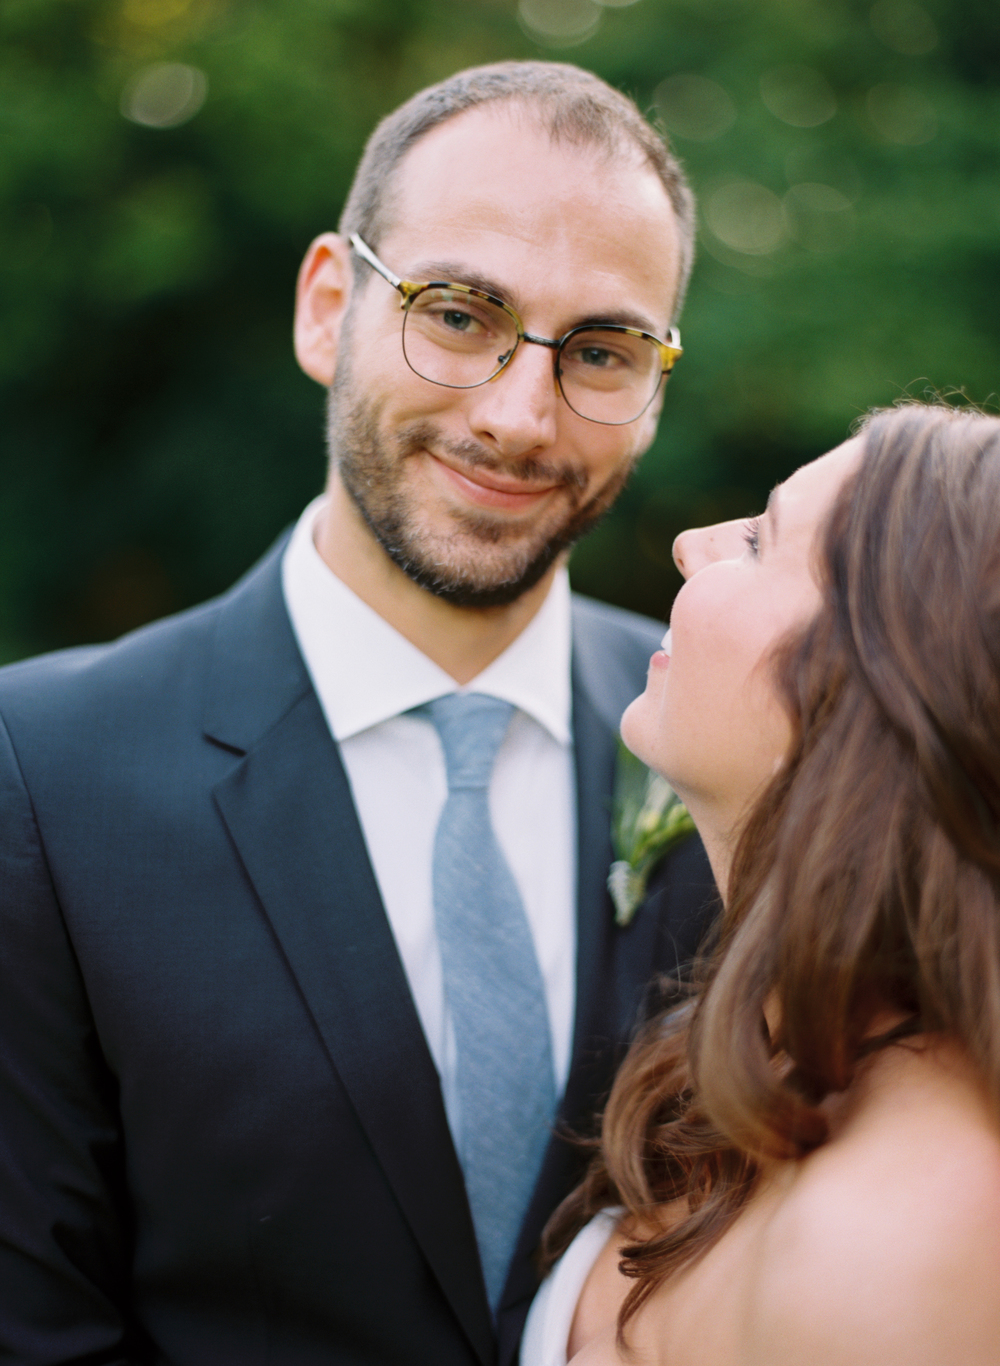 italian groom blue suit wedding